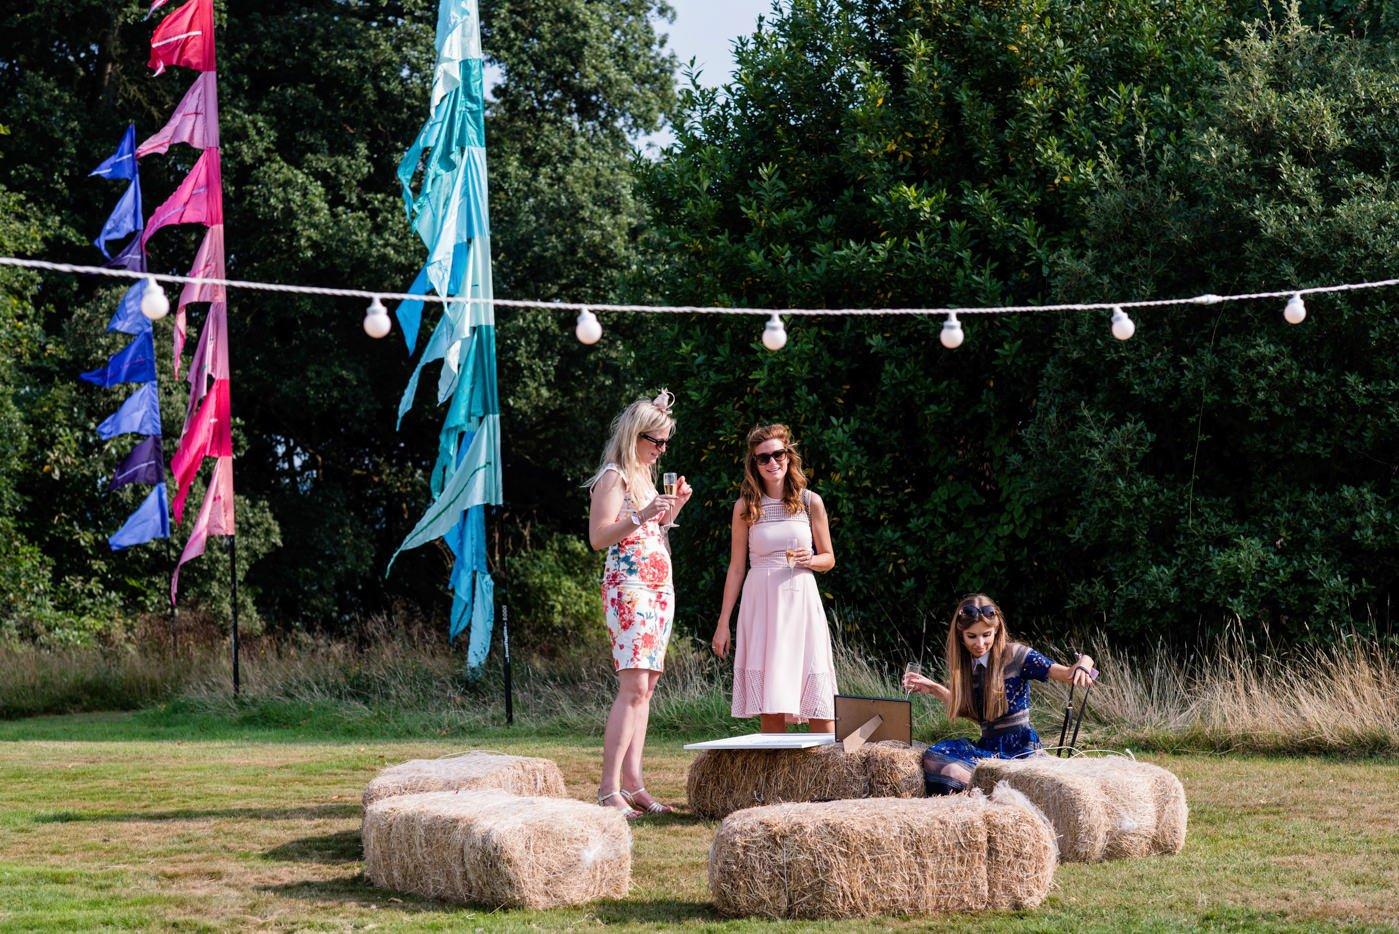 bignor-park-wedding-photography-robyn-and-tom-84